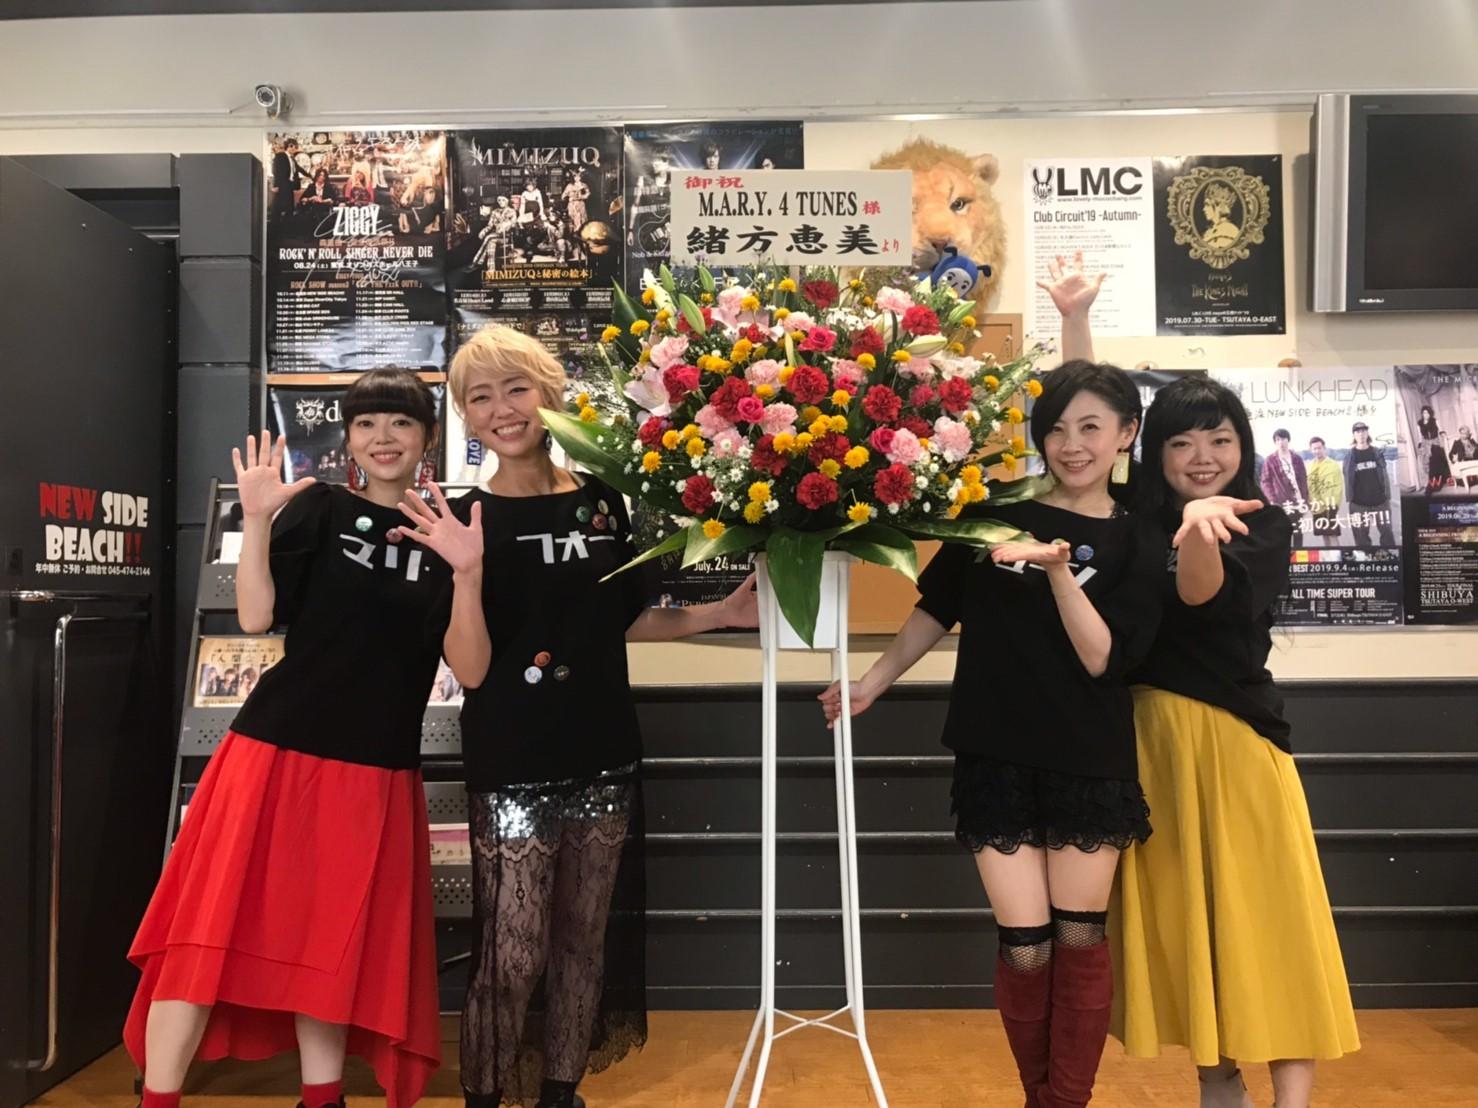 M.A.R.Y. 4 TUNES ∞ TALK LIVE 〜令和でフィーバー!お喋りチューニング〜_e0189353_22232994.jpg